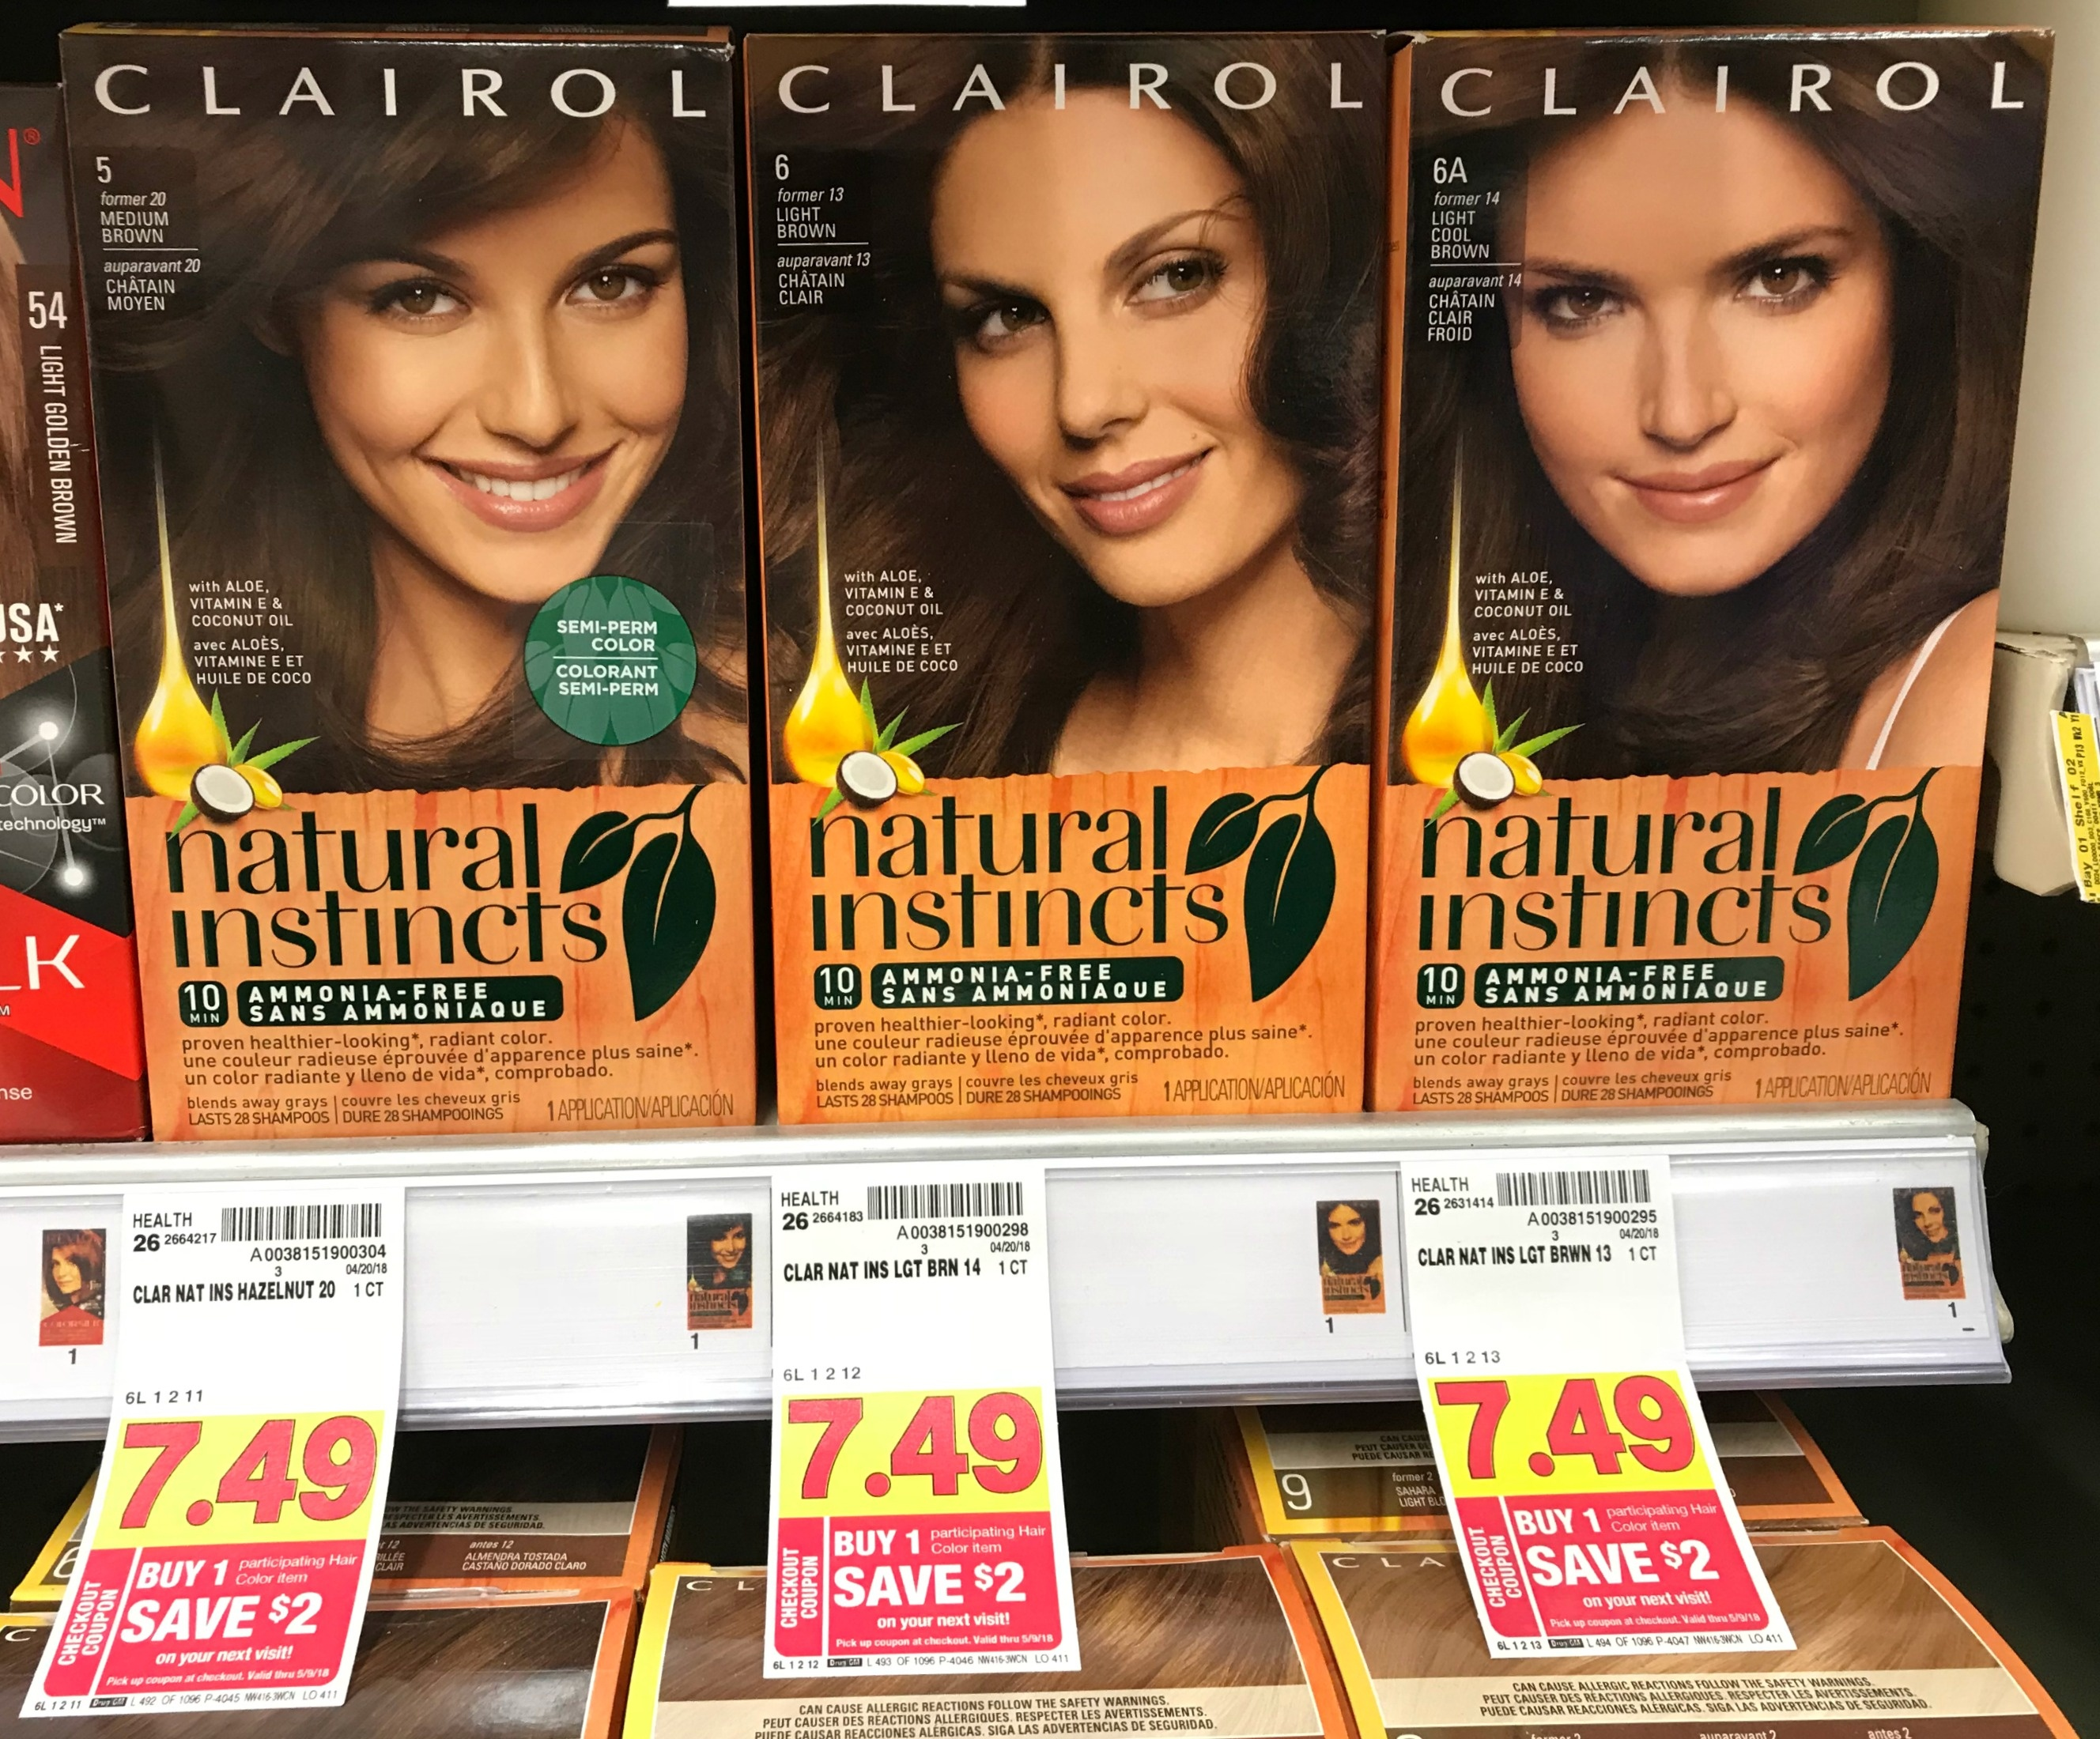 New Clairol Coupon + Catalina = Free Hair Color At Kroger!! | Kroger - Free Hair Dye Coupons Printable